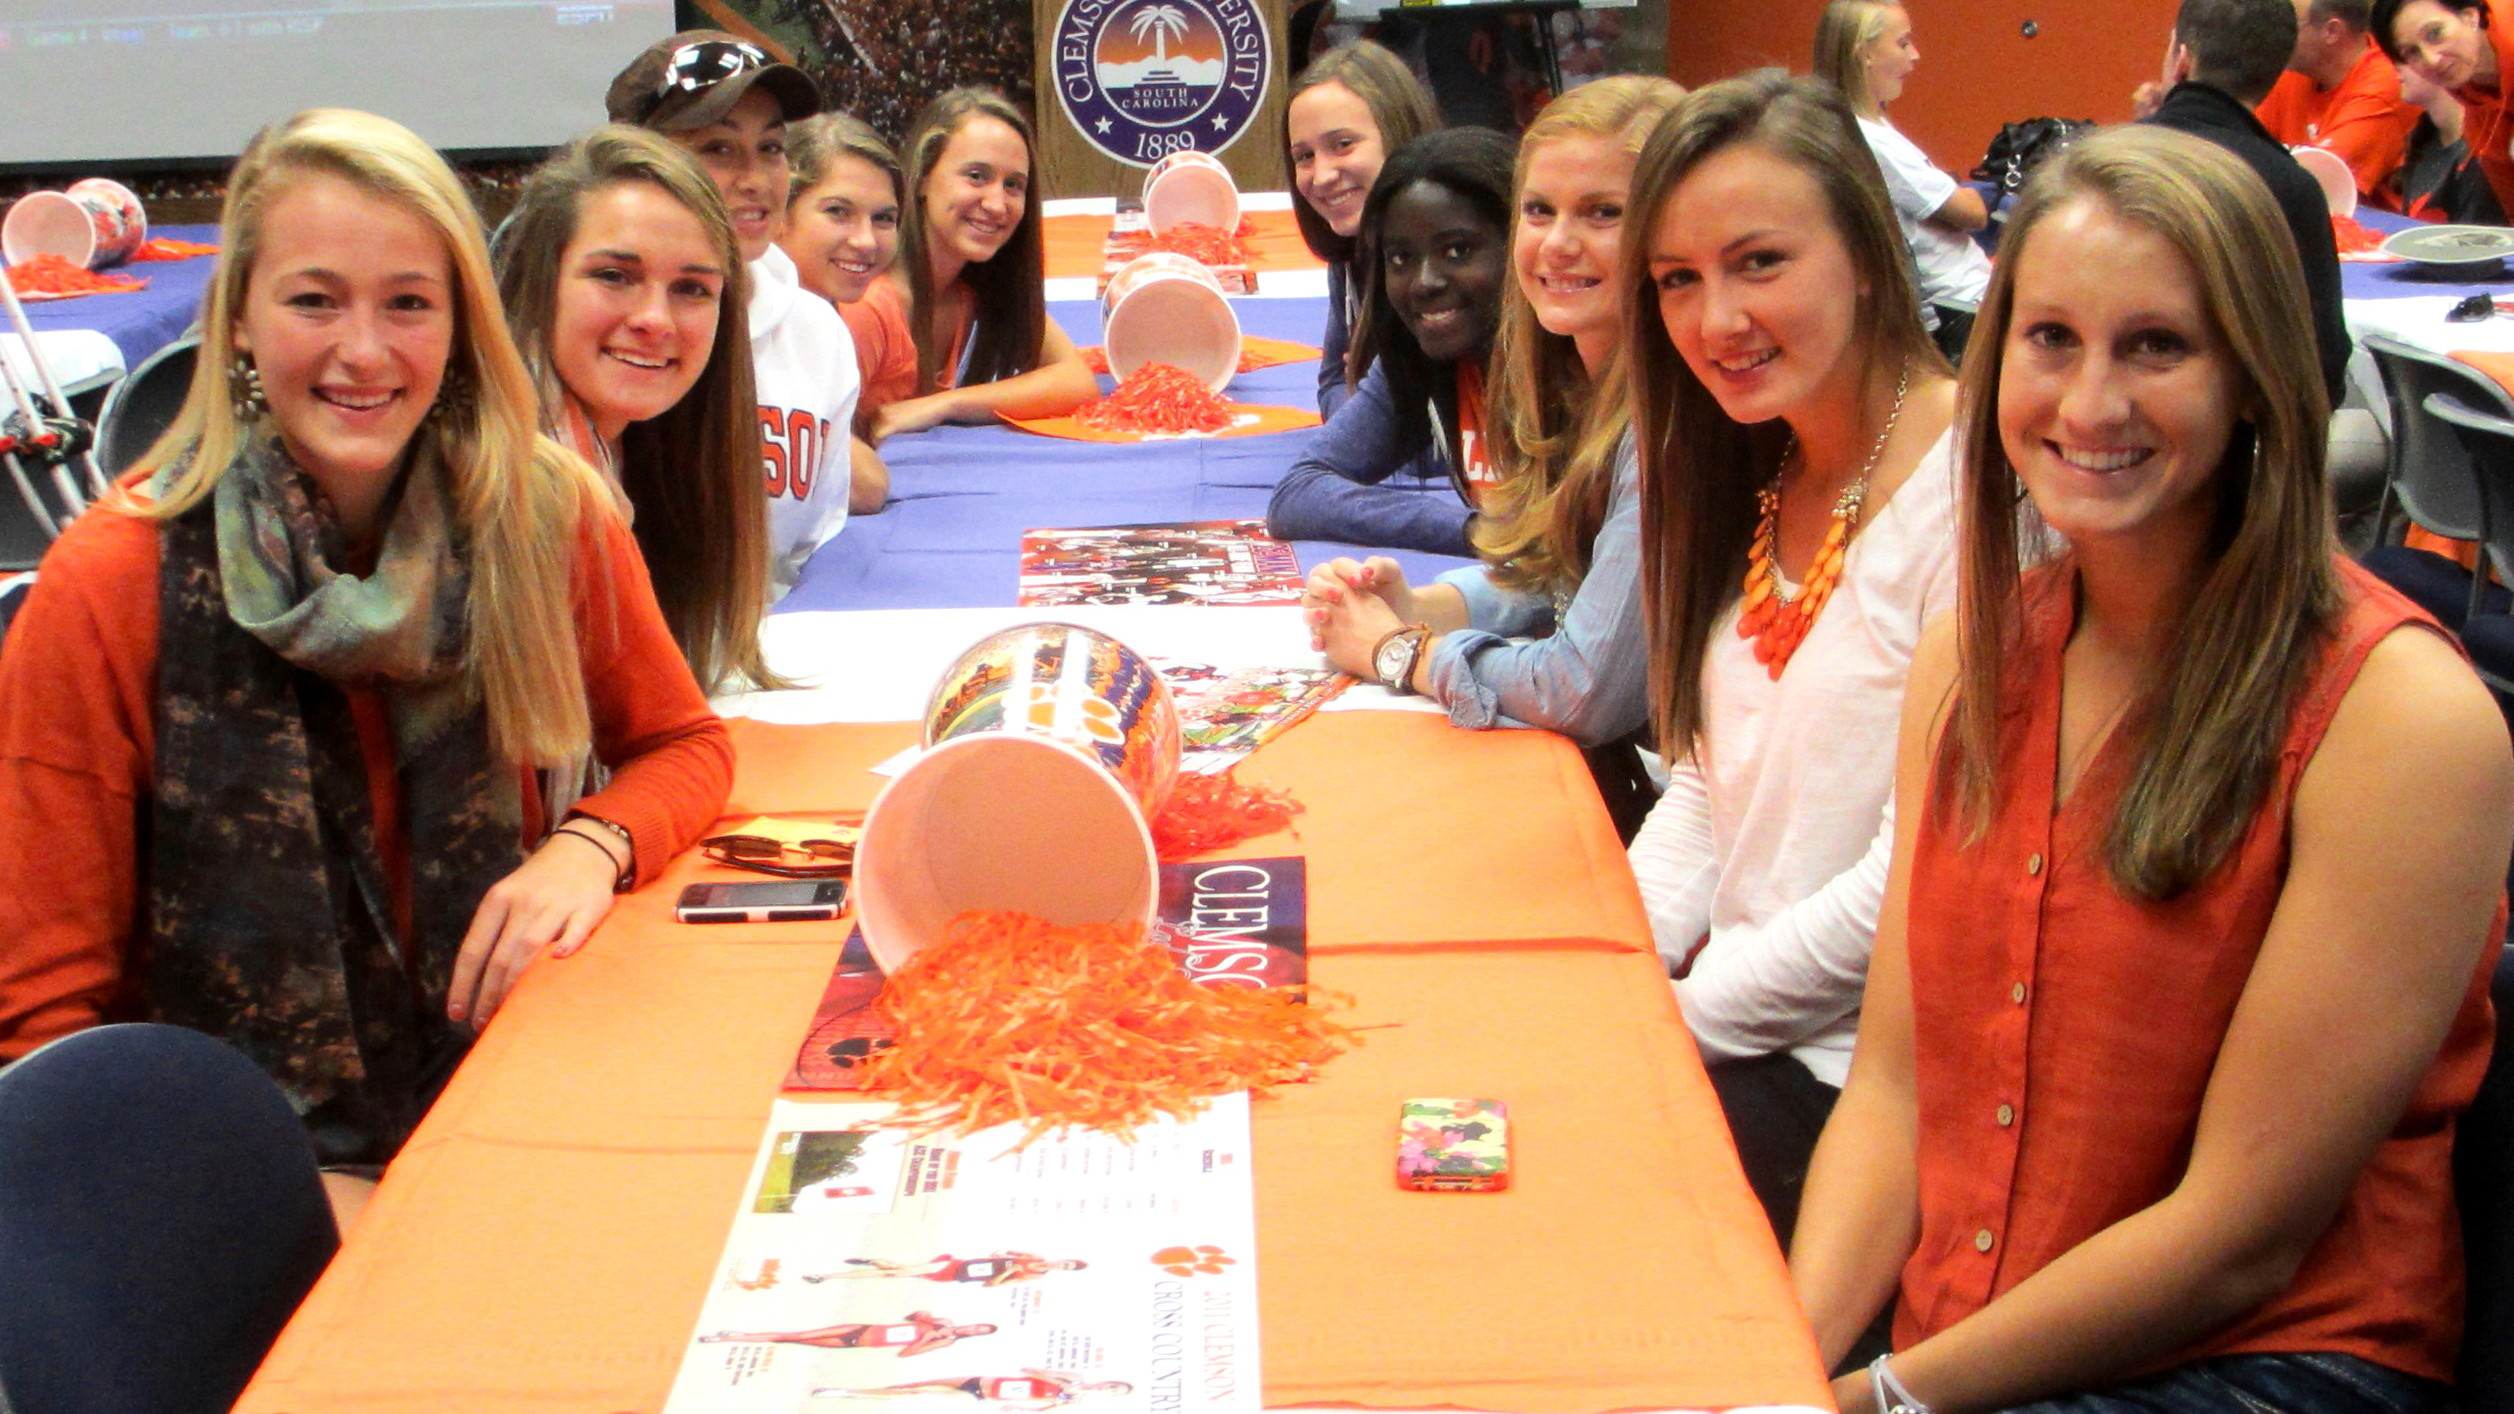 Clemson Women's Soccer Program Signs 11 Players for 2013